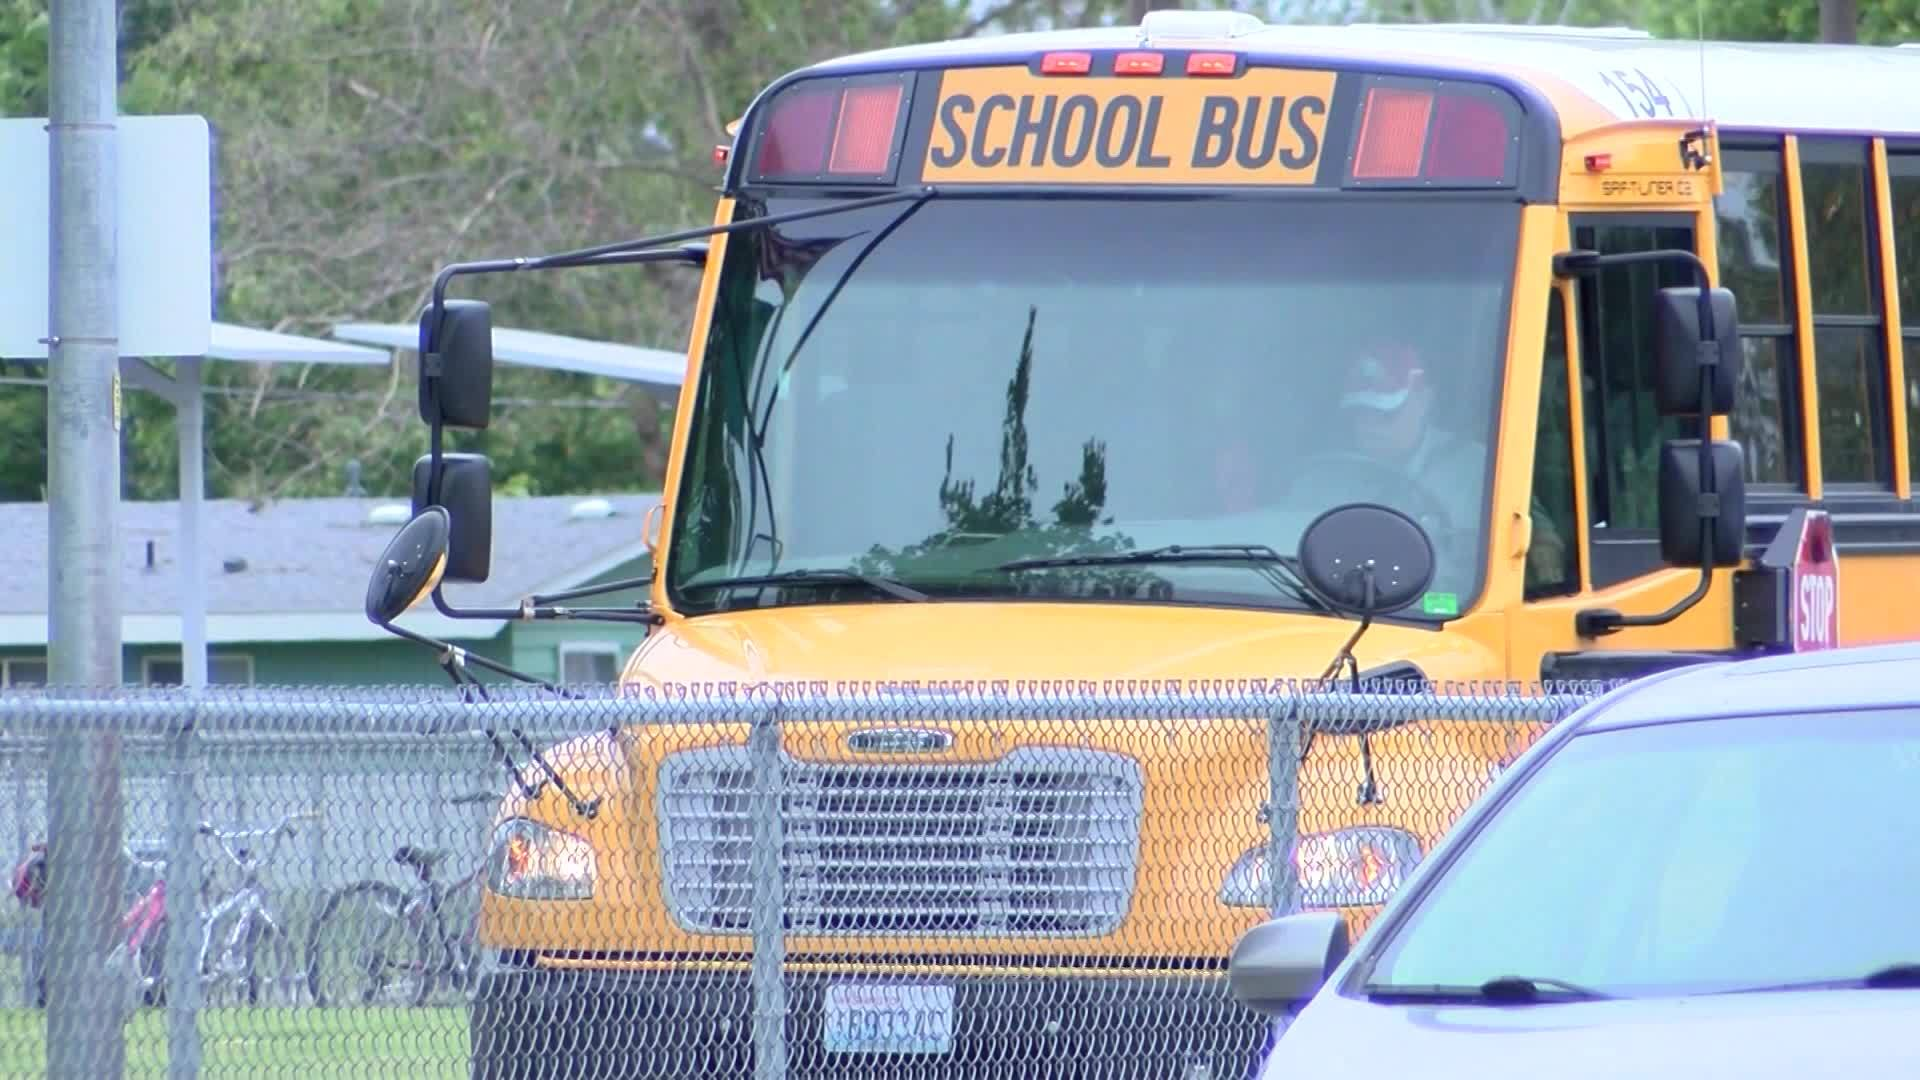 Child brings meth to elementary school, asks teacher for help